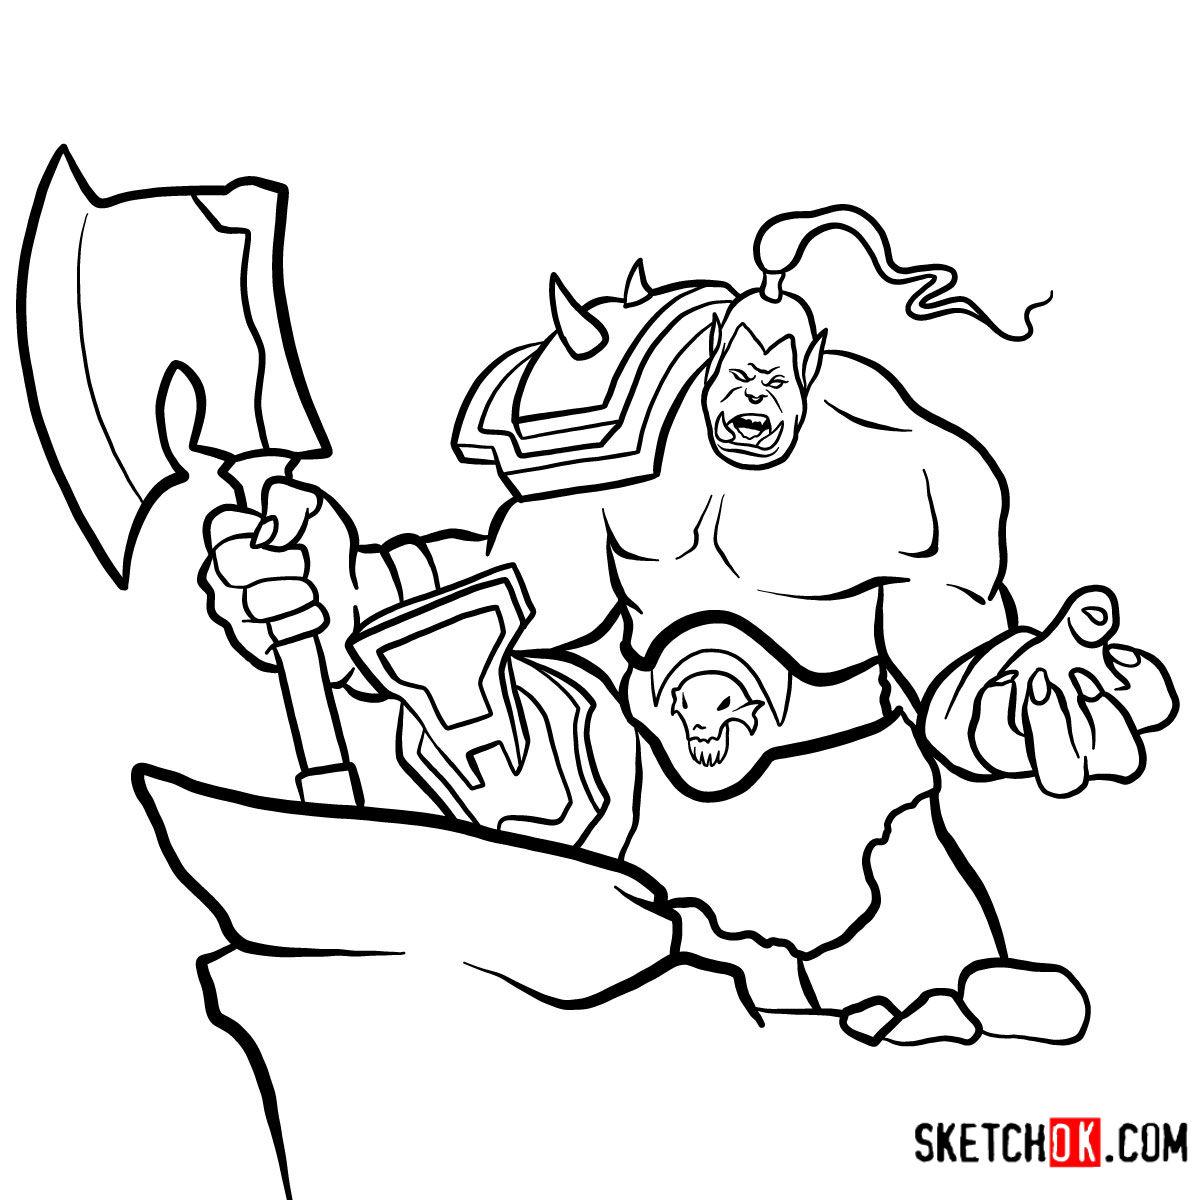 How to draw Grommash Hellscream